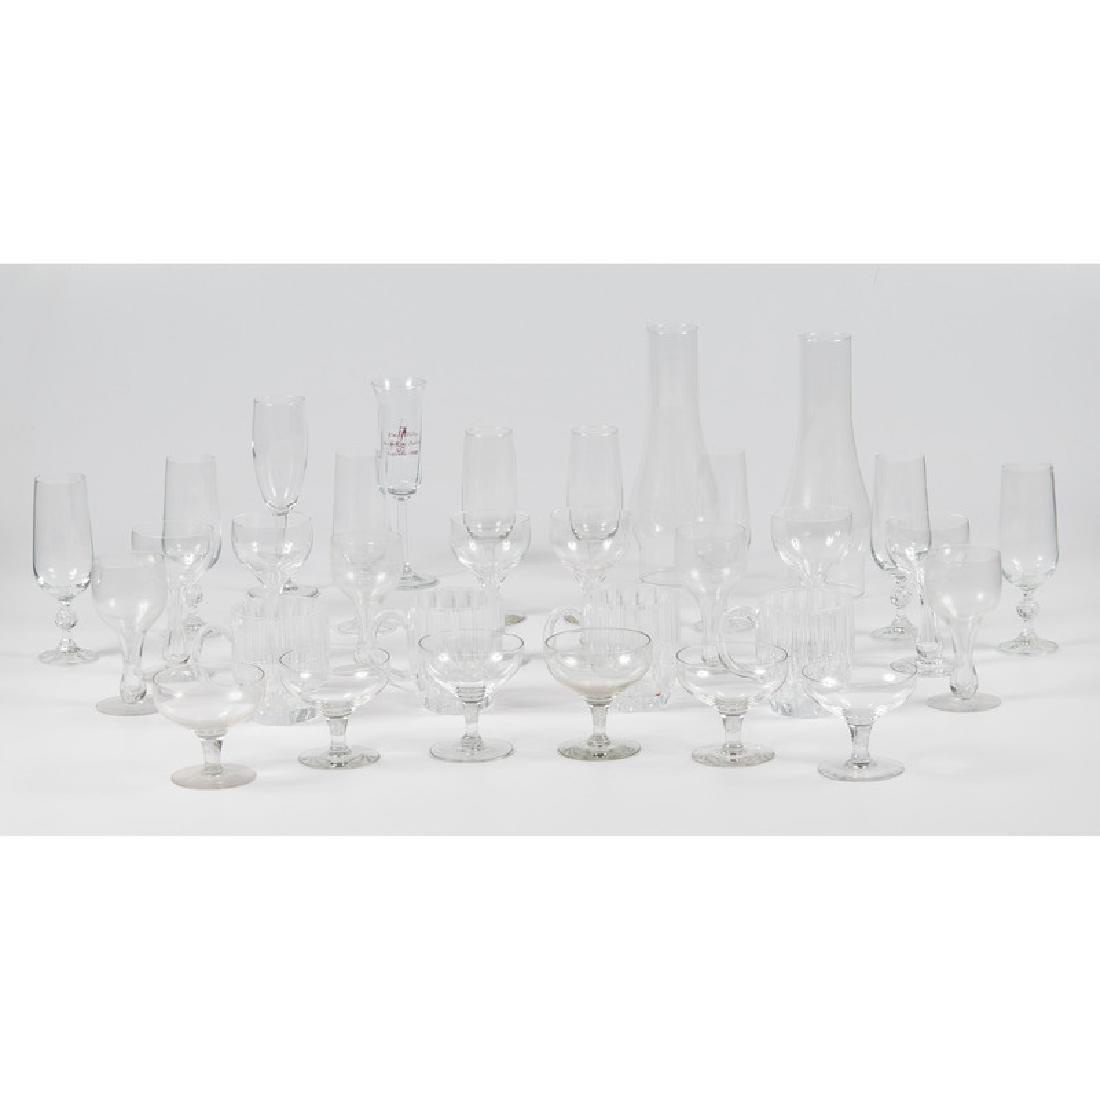 Assorted Glass Stemware and Mugs, PLUS